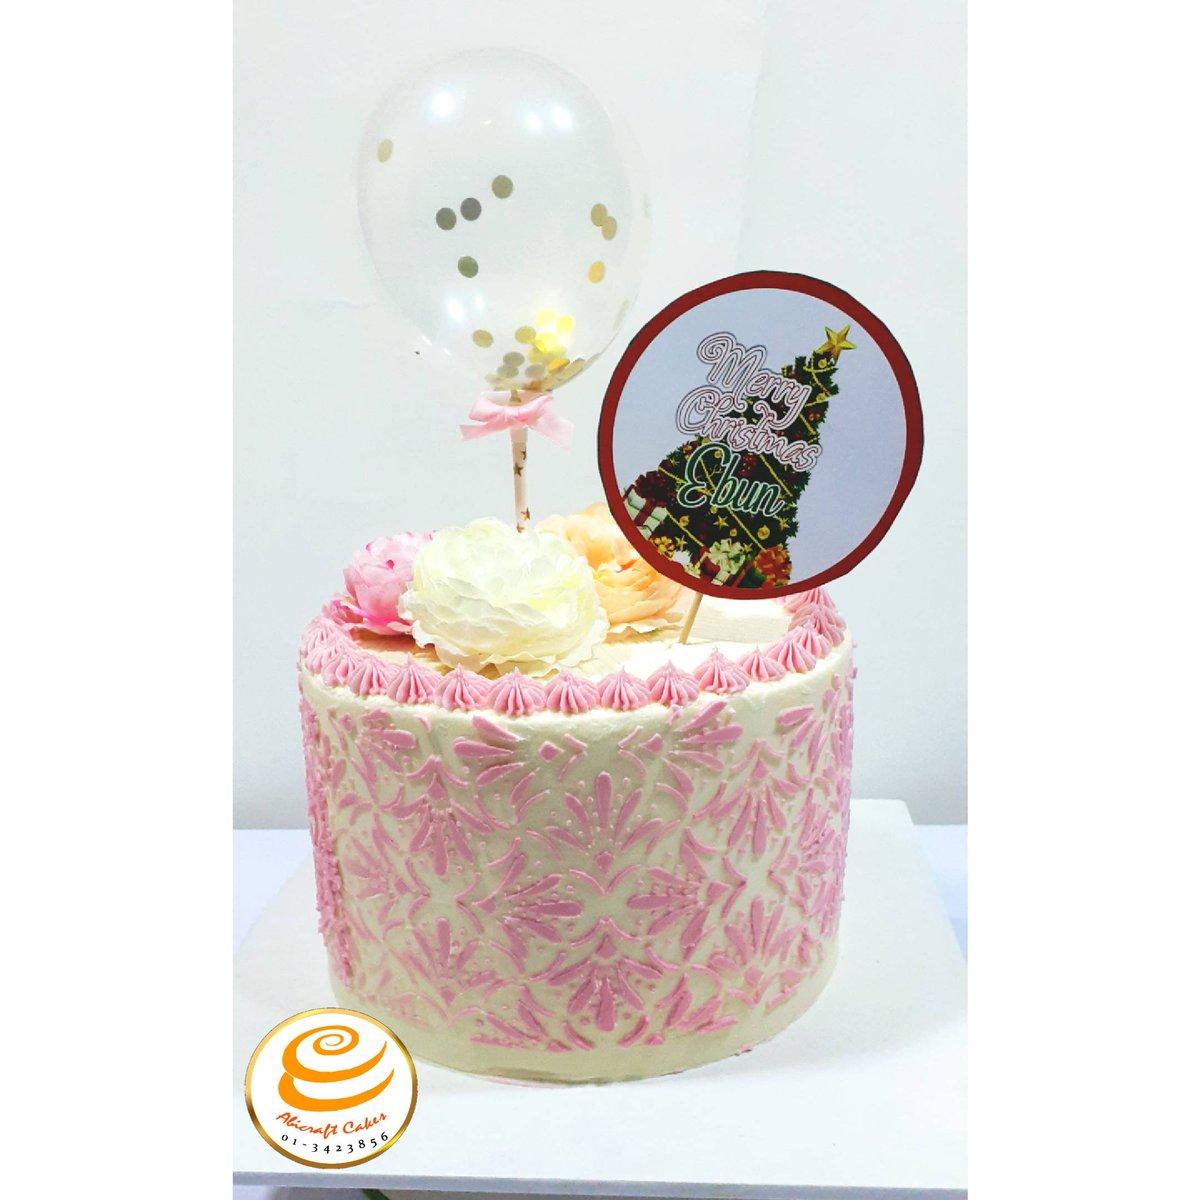 From the archives! #christmascakes  Stencil from @kogsysugarcraft #Tbt #buttercreamcakelover #buttercreamstencil #cakestencil #lagosevents #buttercreamgoodness #buttercreamdesign #cakelagos #celebrationcaksinlagos  #vendorsconnectpod  #yummy #cakeforgirls #confetti #abicraftcakes